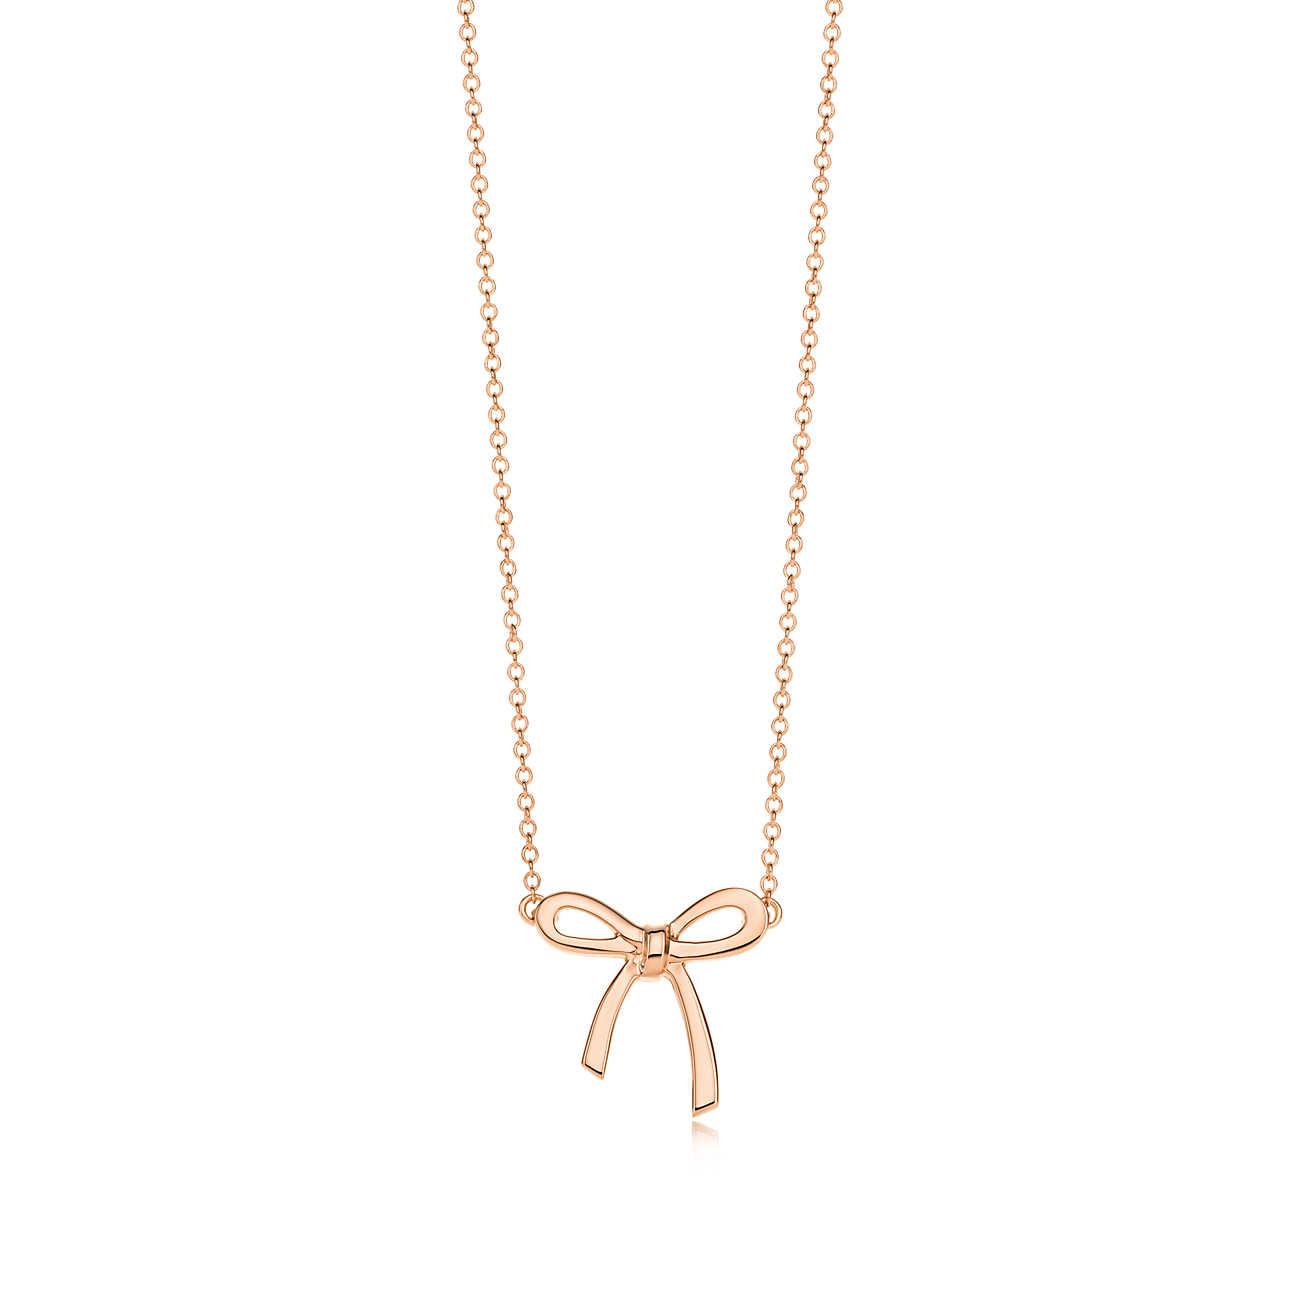 Tiffany Co.18K玫瑰金蝴蝶结吊坠项链 33833806